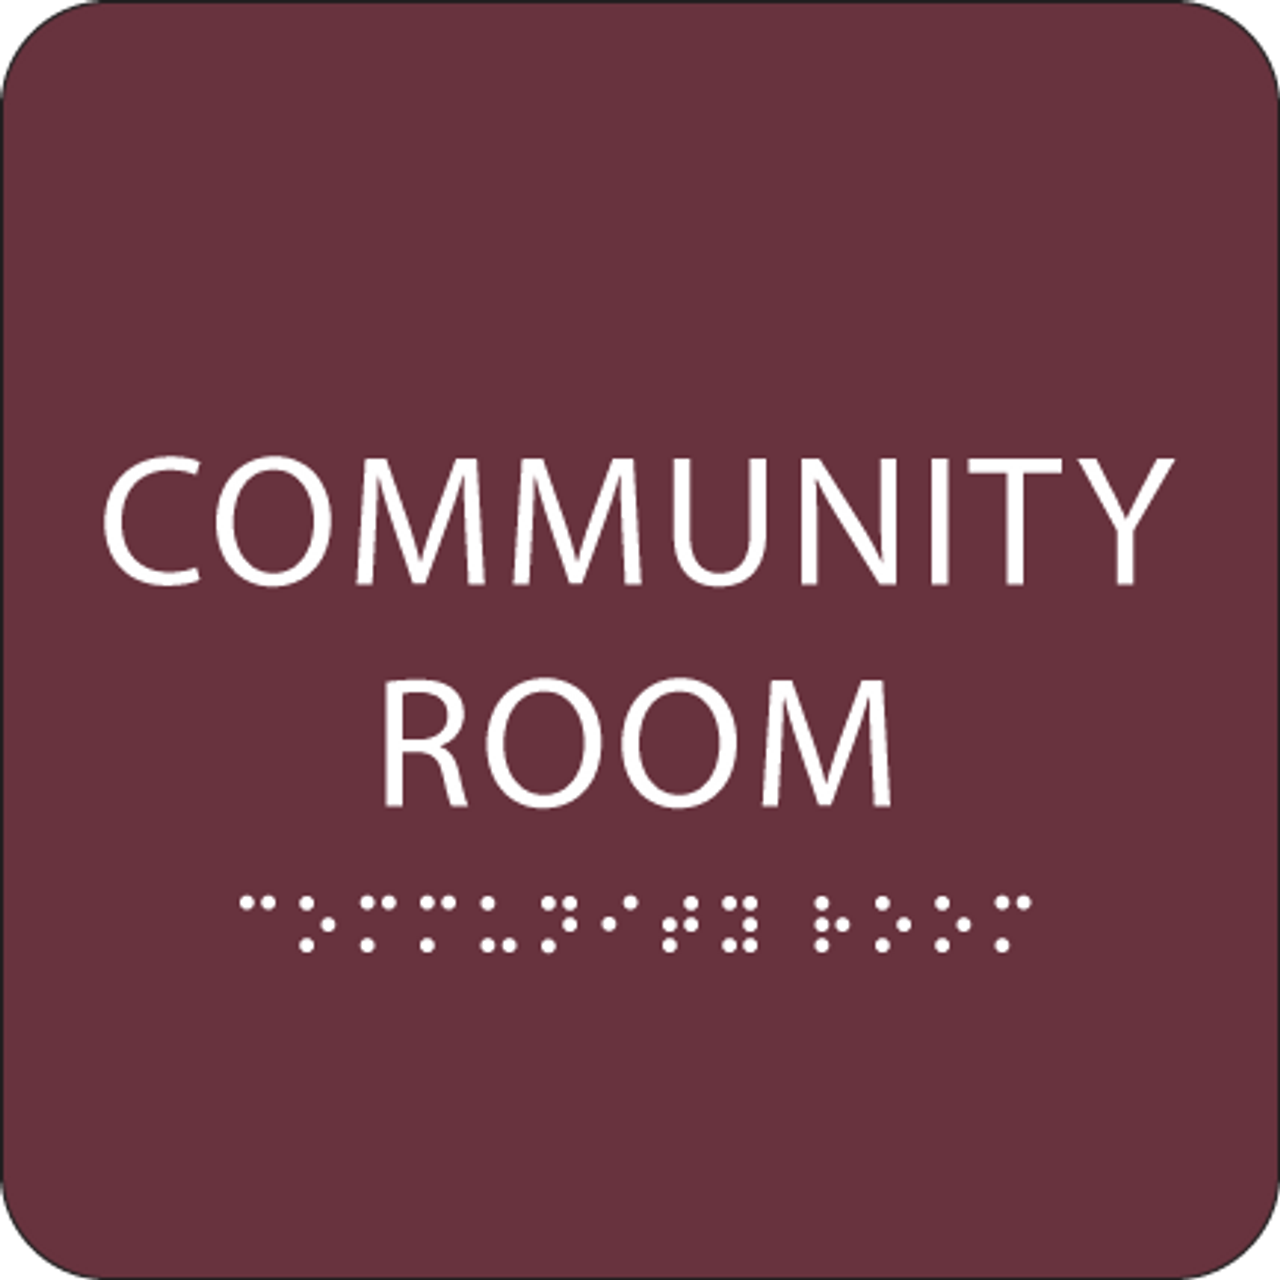 Burgundy Community Room ADA Sign